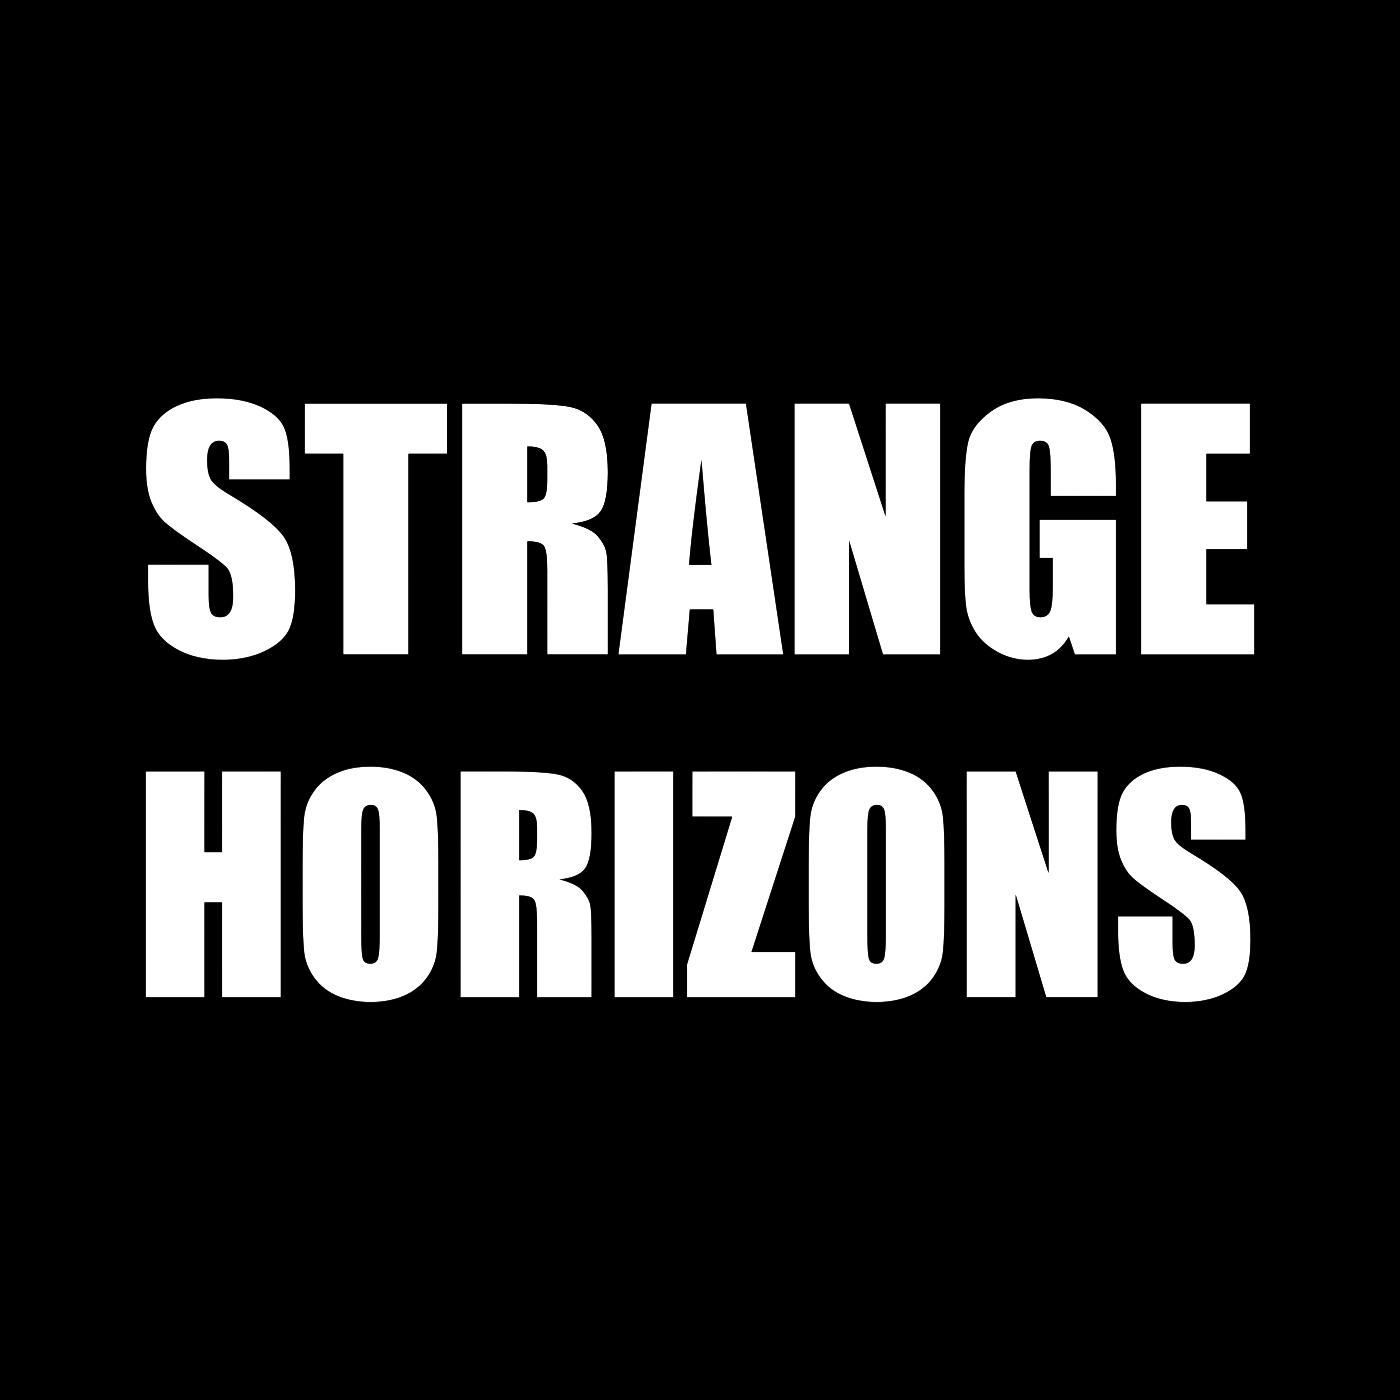 Strange Horizons